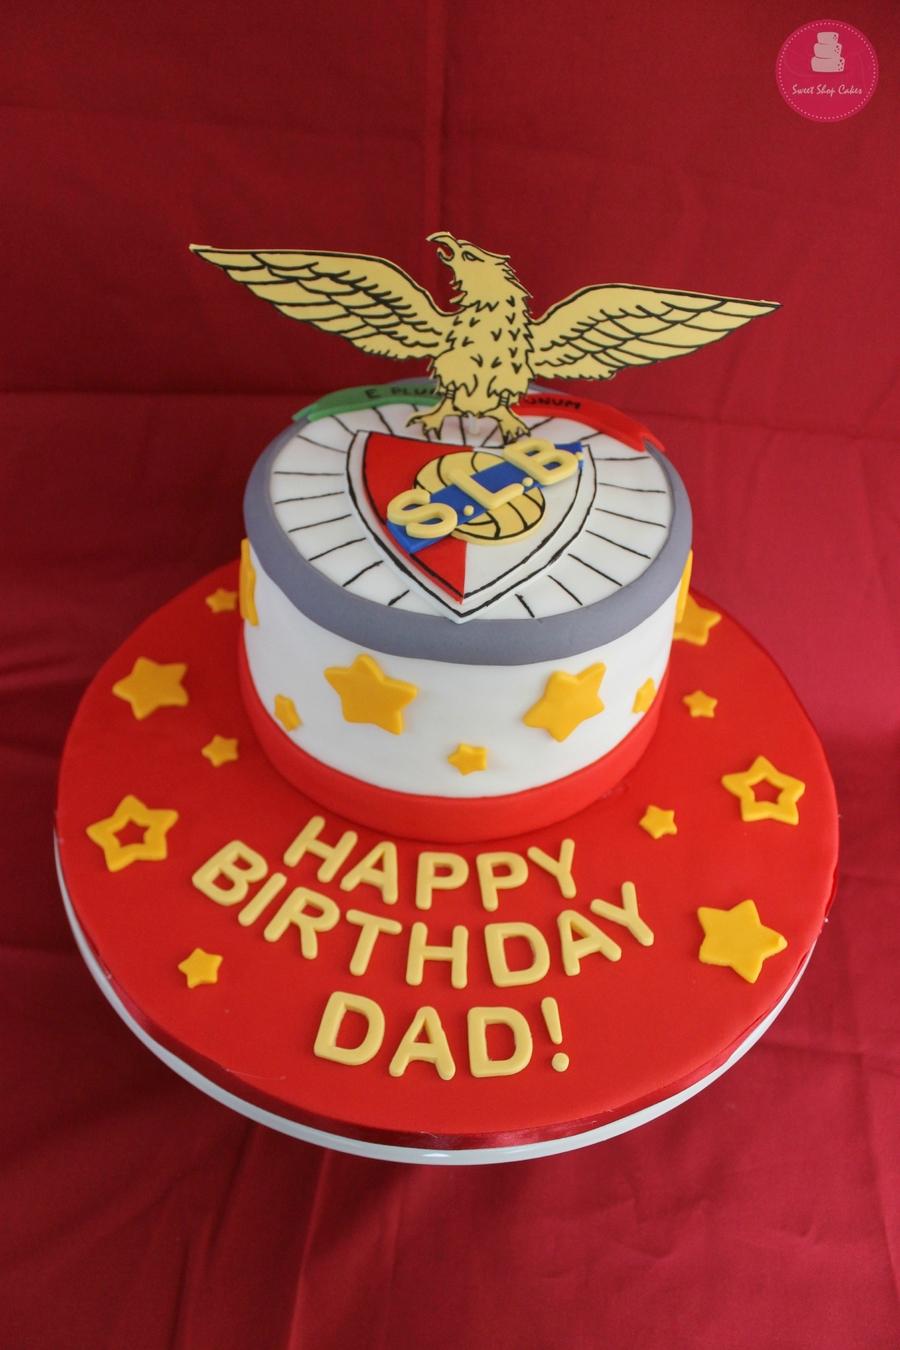 R2hbJl9aI0-slb-benfica-birthday-cake_900.jpg